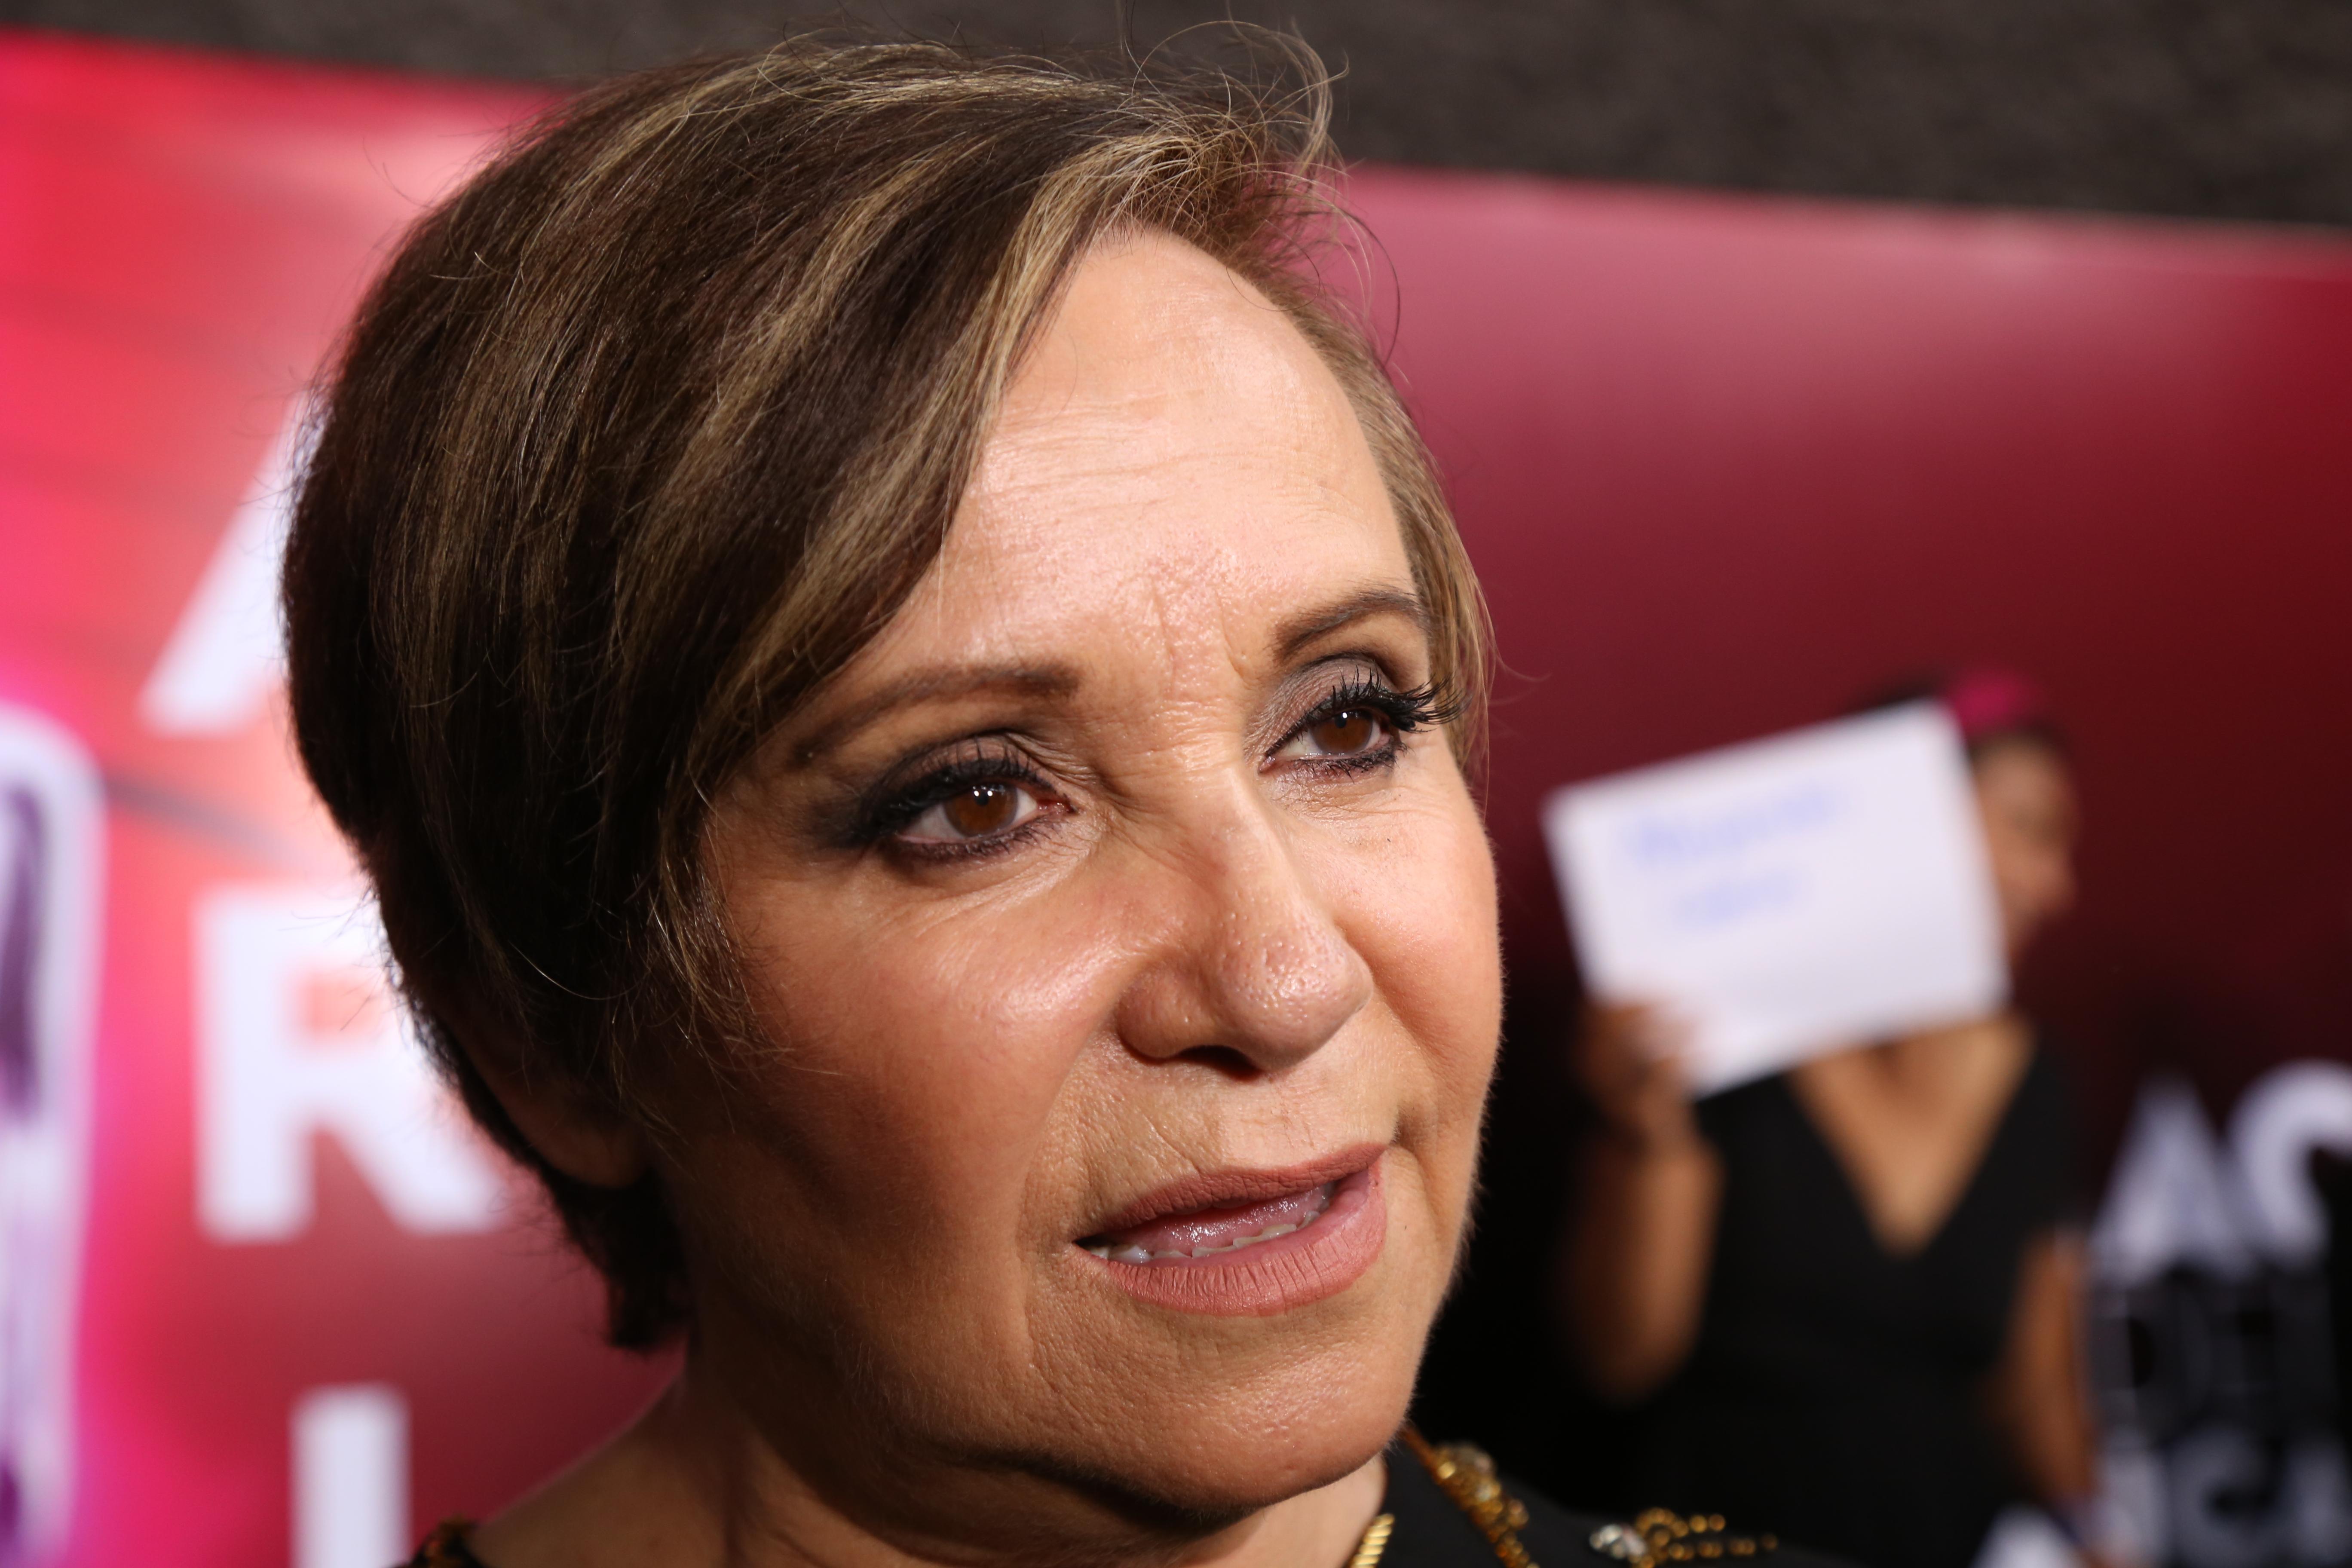 Adriana Barraza (Foto: Juan Vicente Manrique/Infobae)